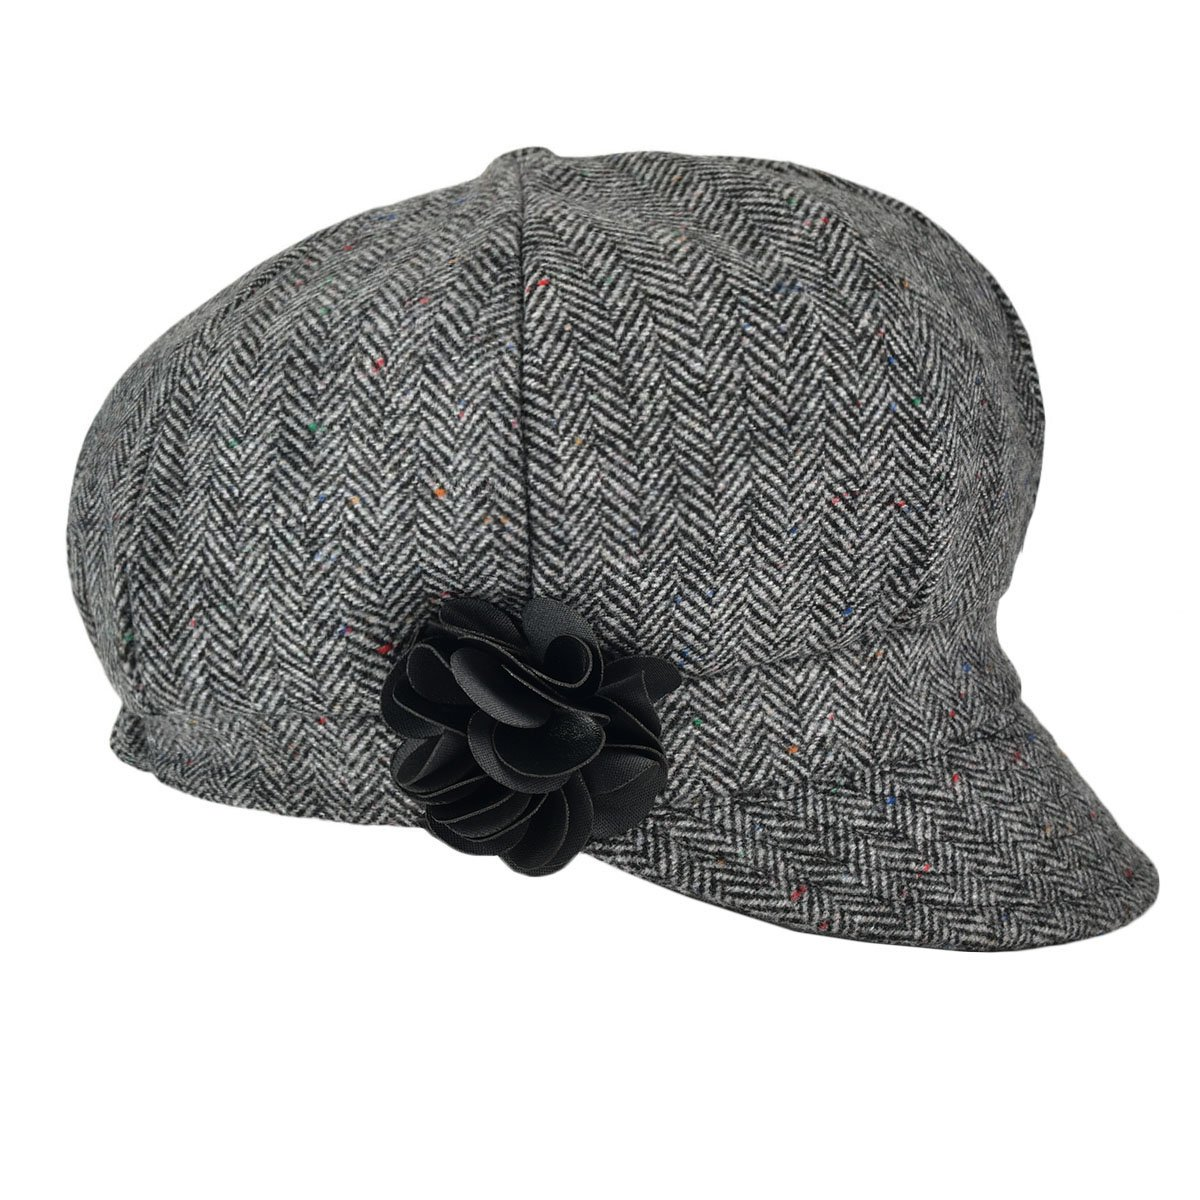 VOBOOM Women's Newsboy Caps Wool Blend Back Adjustable Stretch fit (Grey)